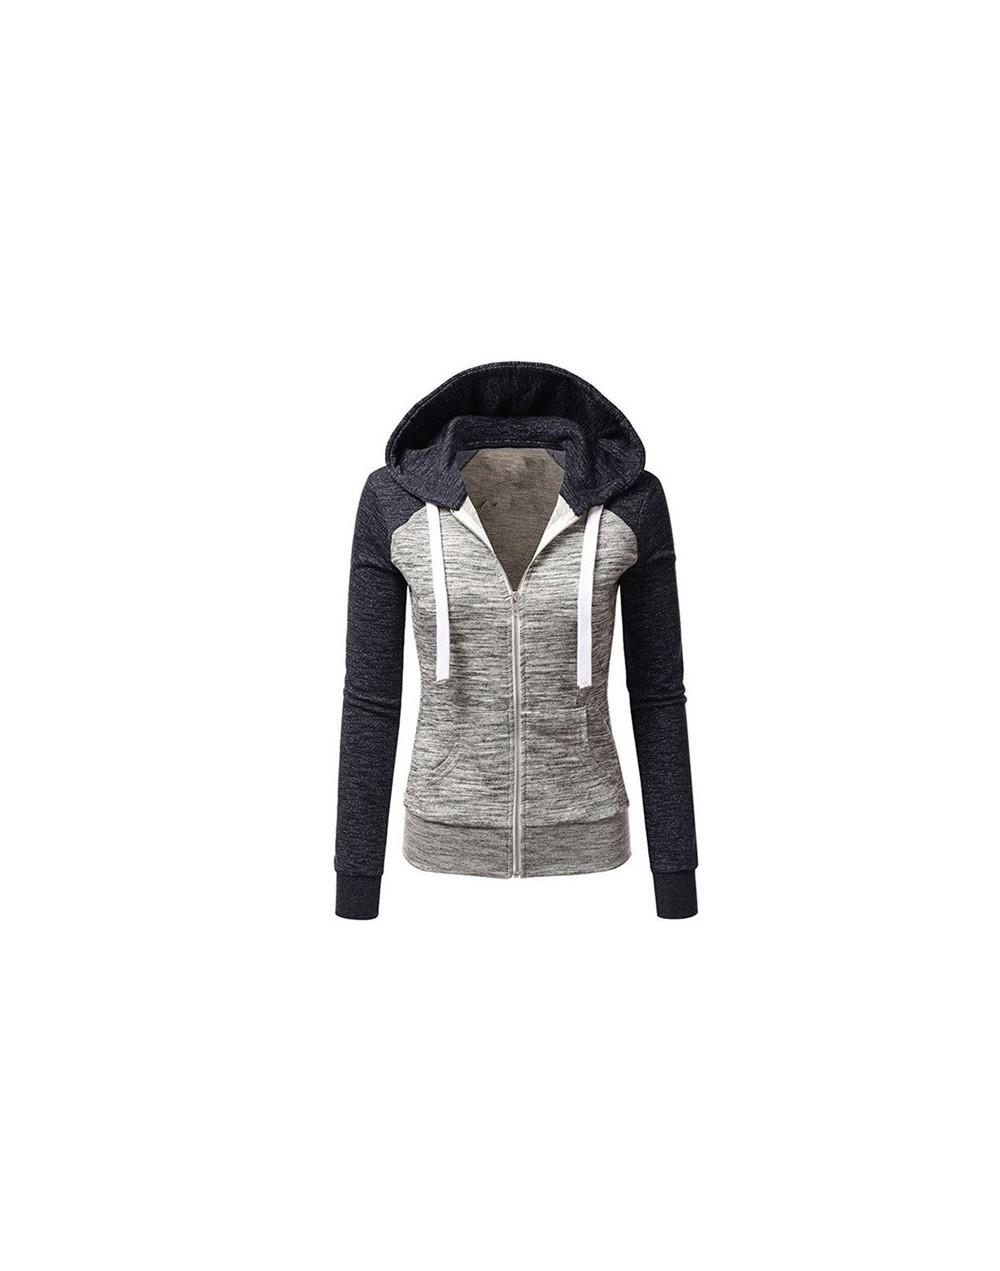 Women Autumn slim Stitching hooded Long sleeves Sweatshirt coat - Blue - 4R4150167807-1